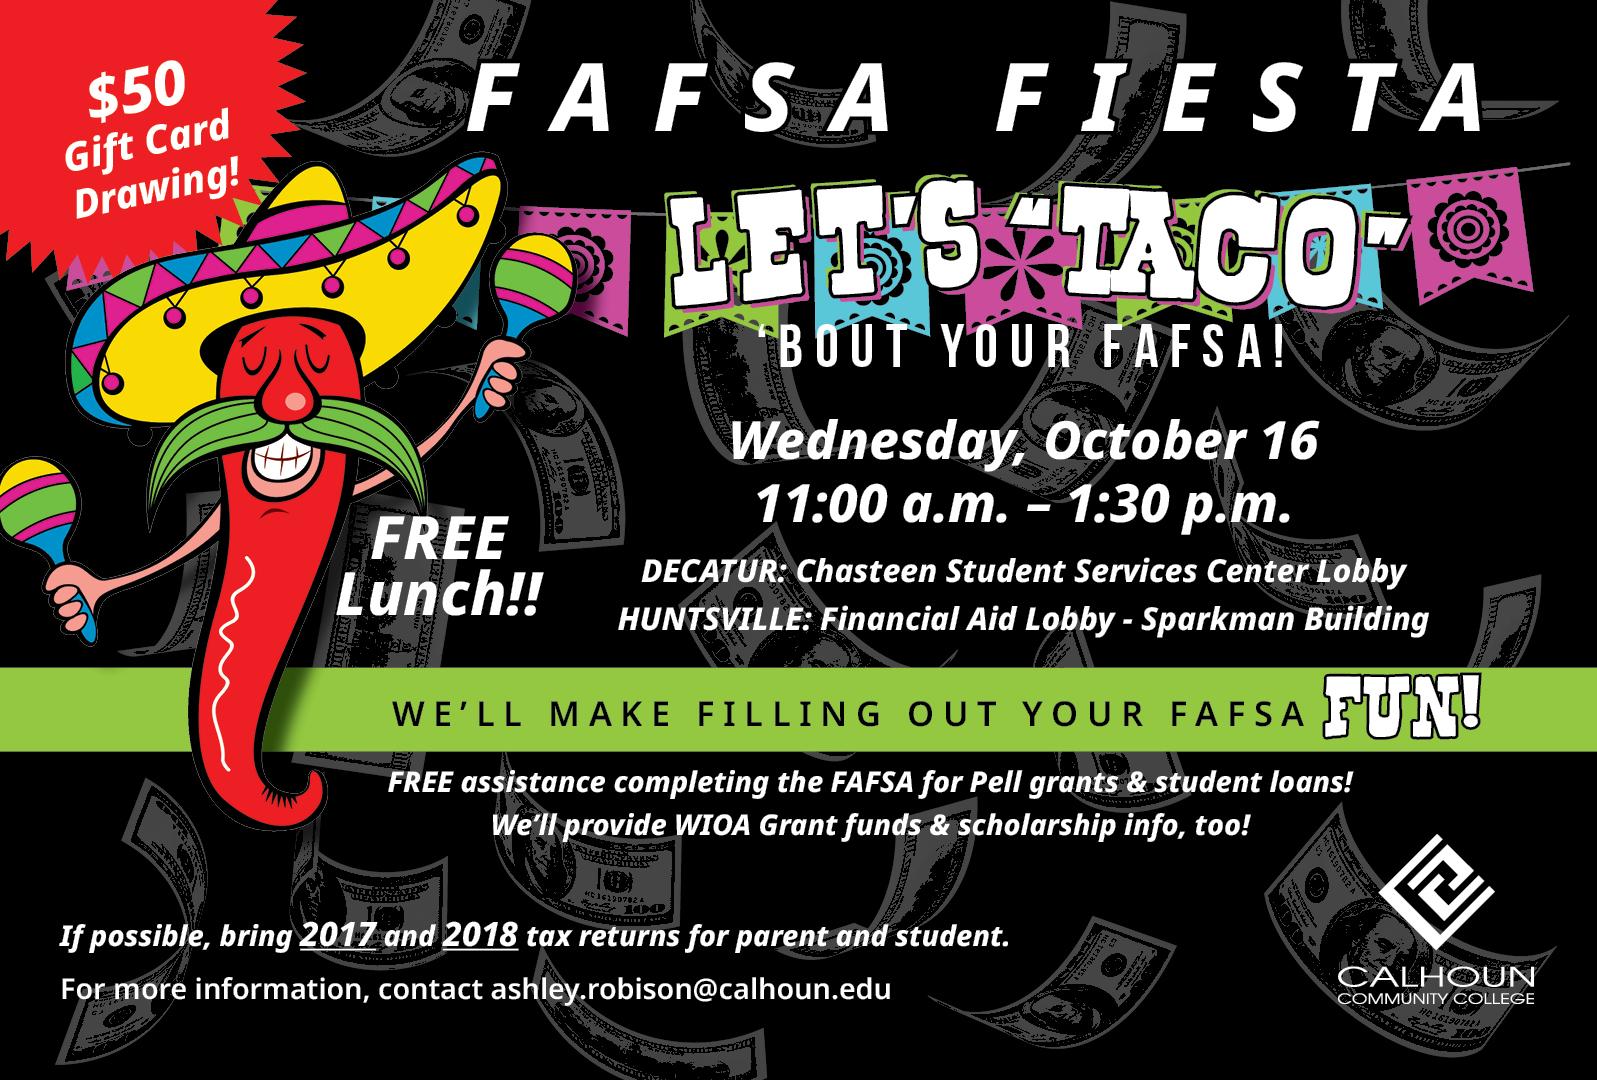 FAFSA Fiesta graphic